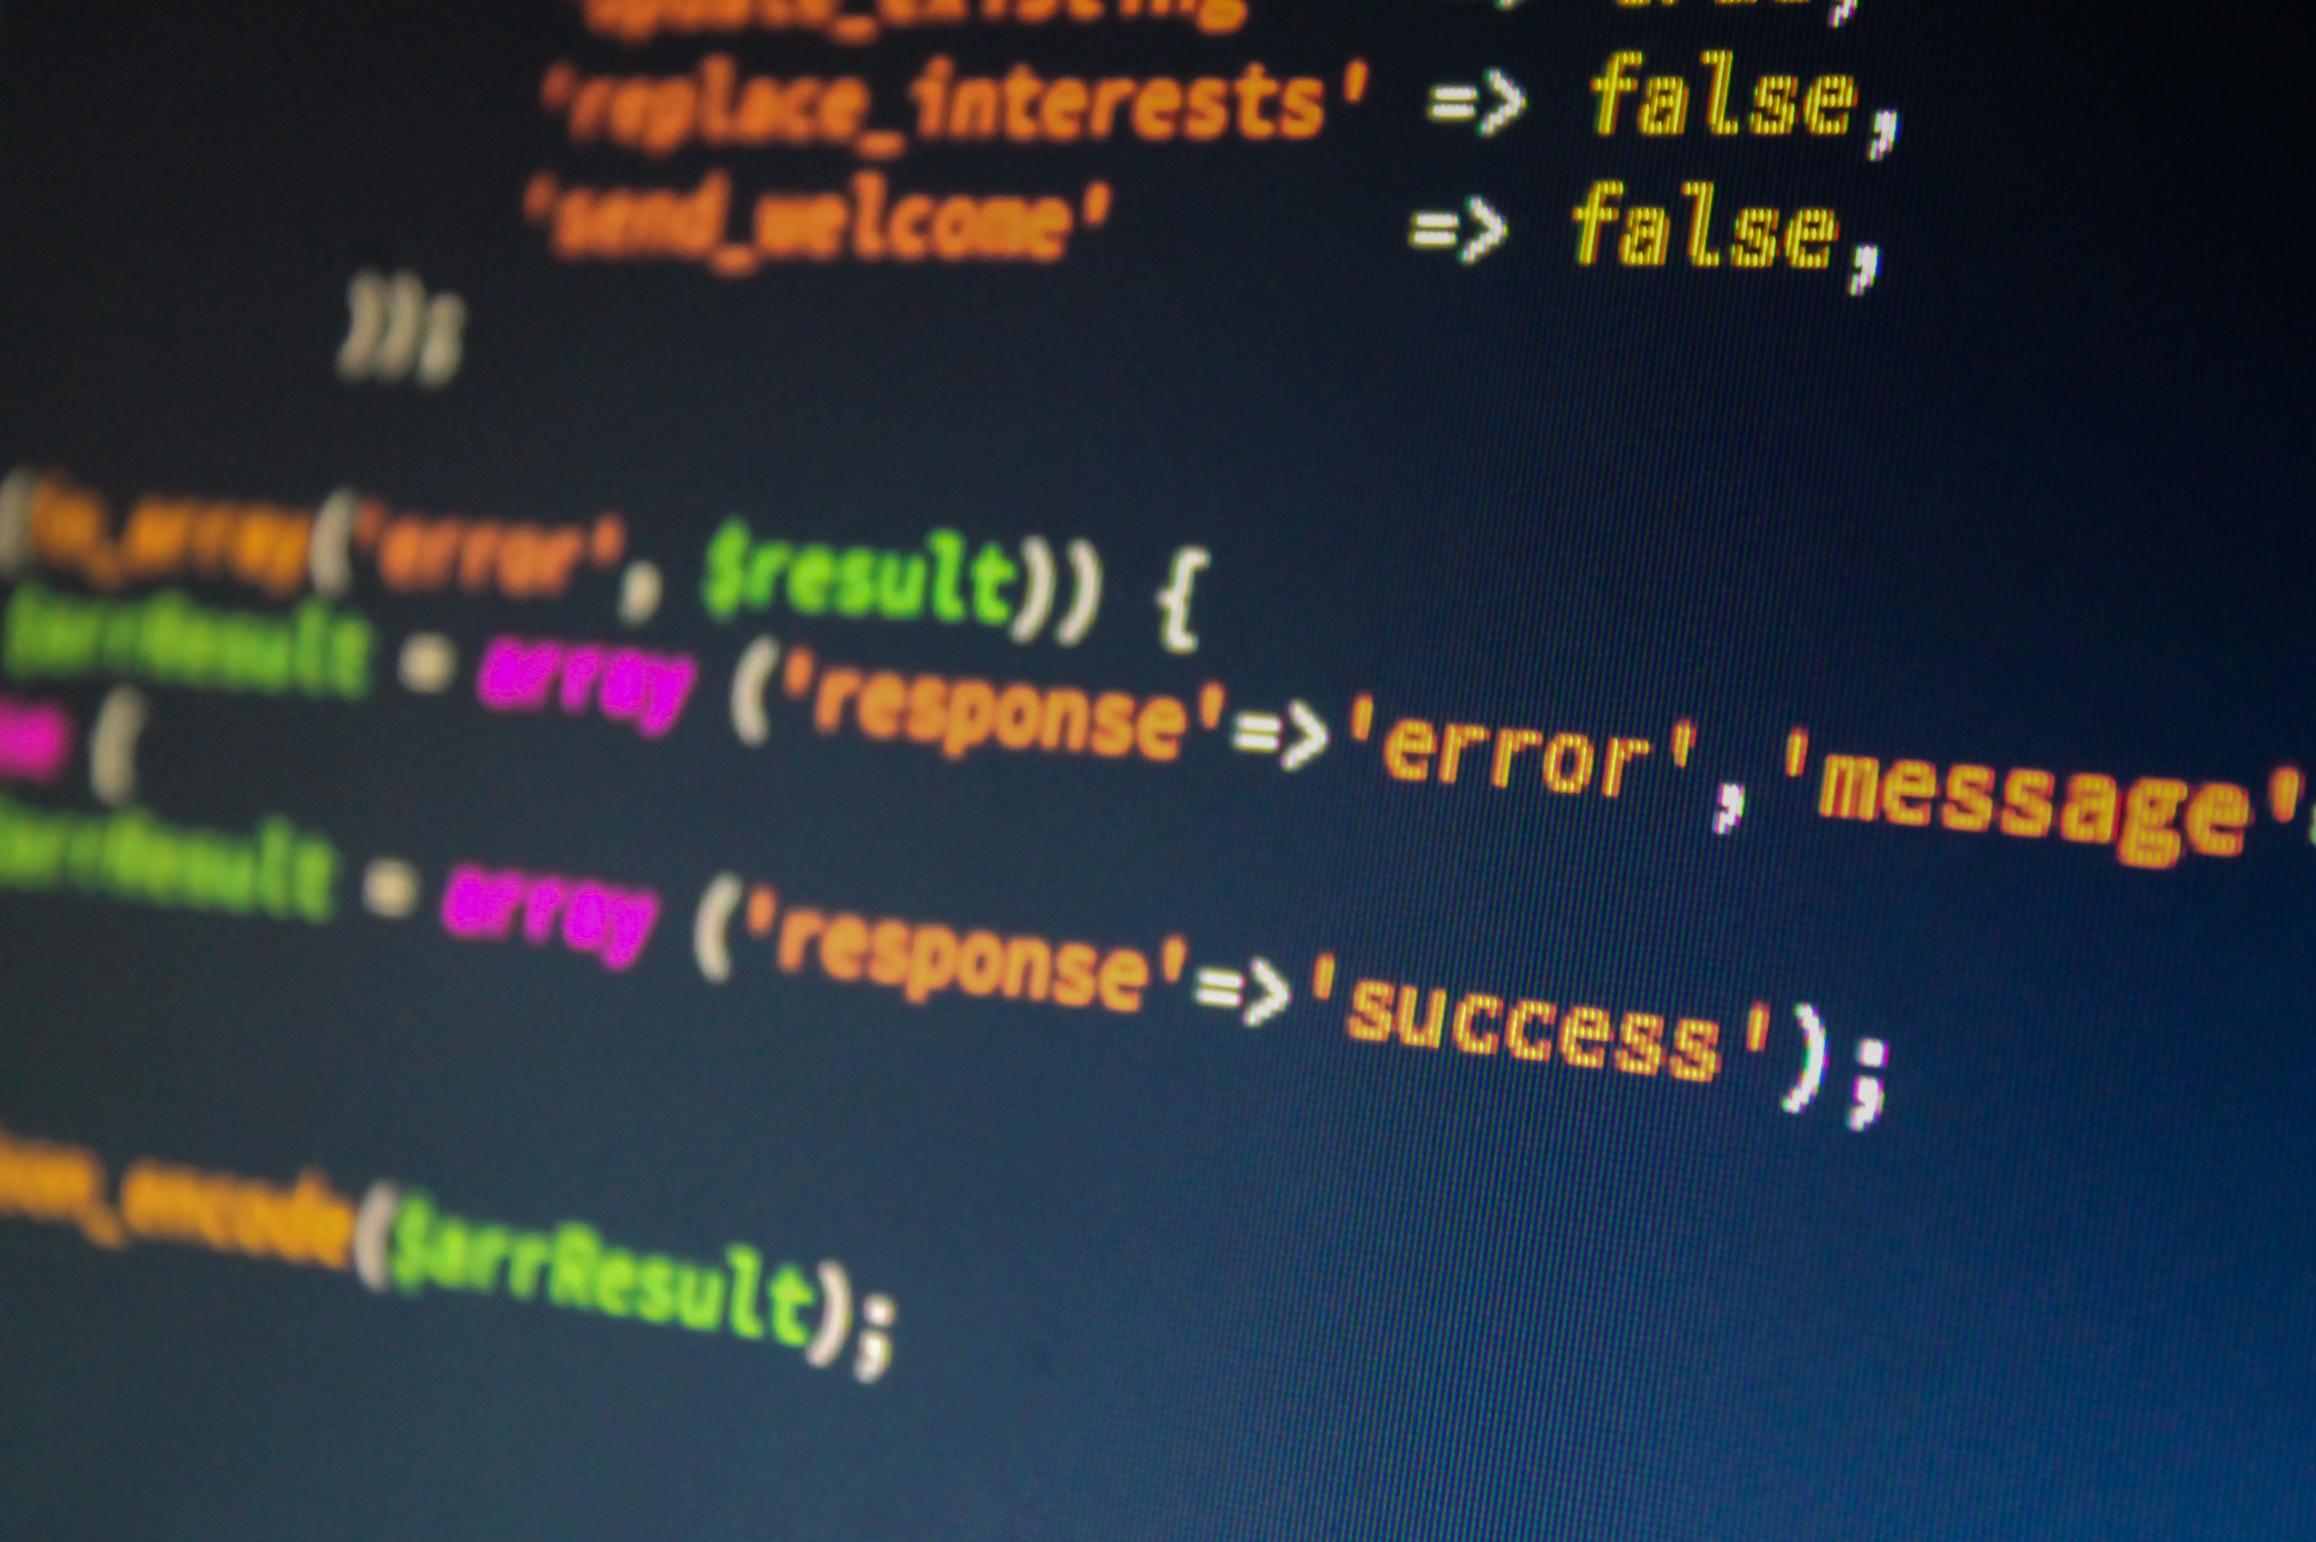 Mycroft code open spurce